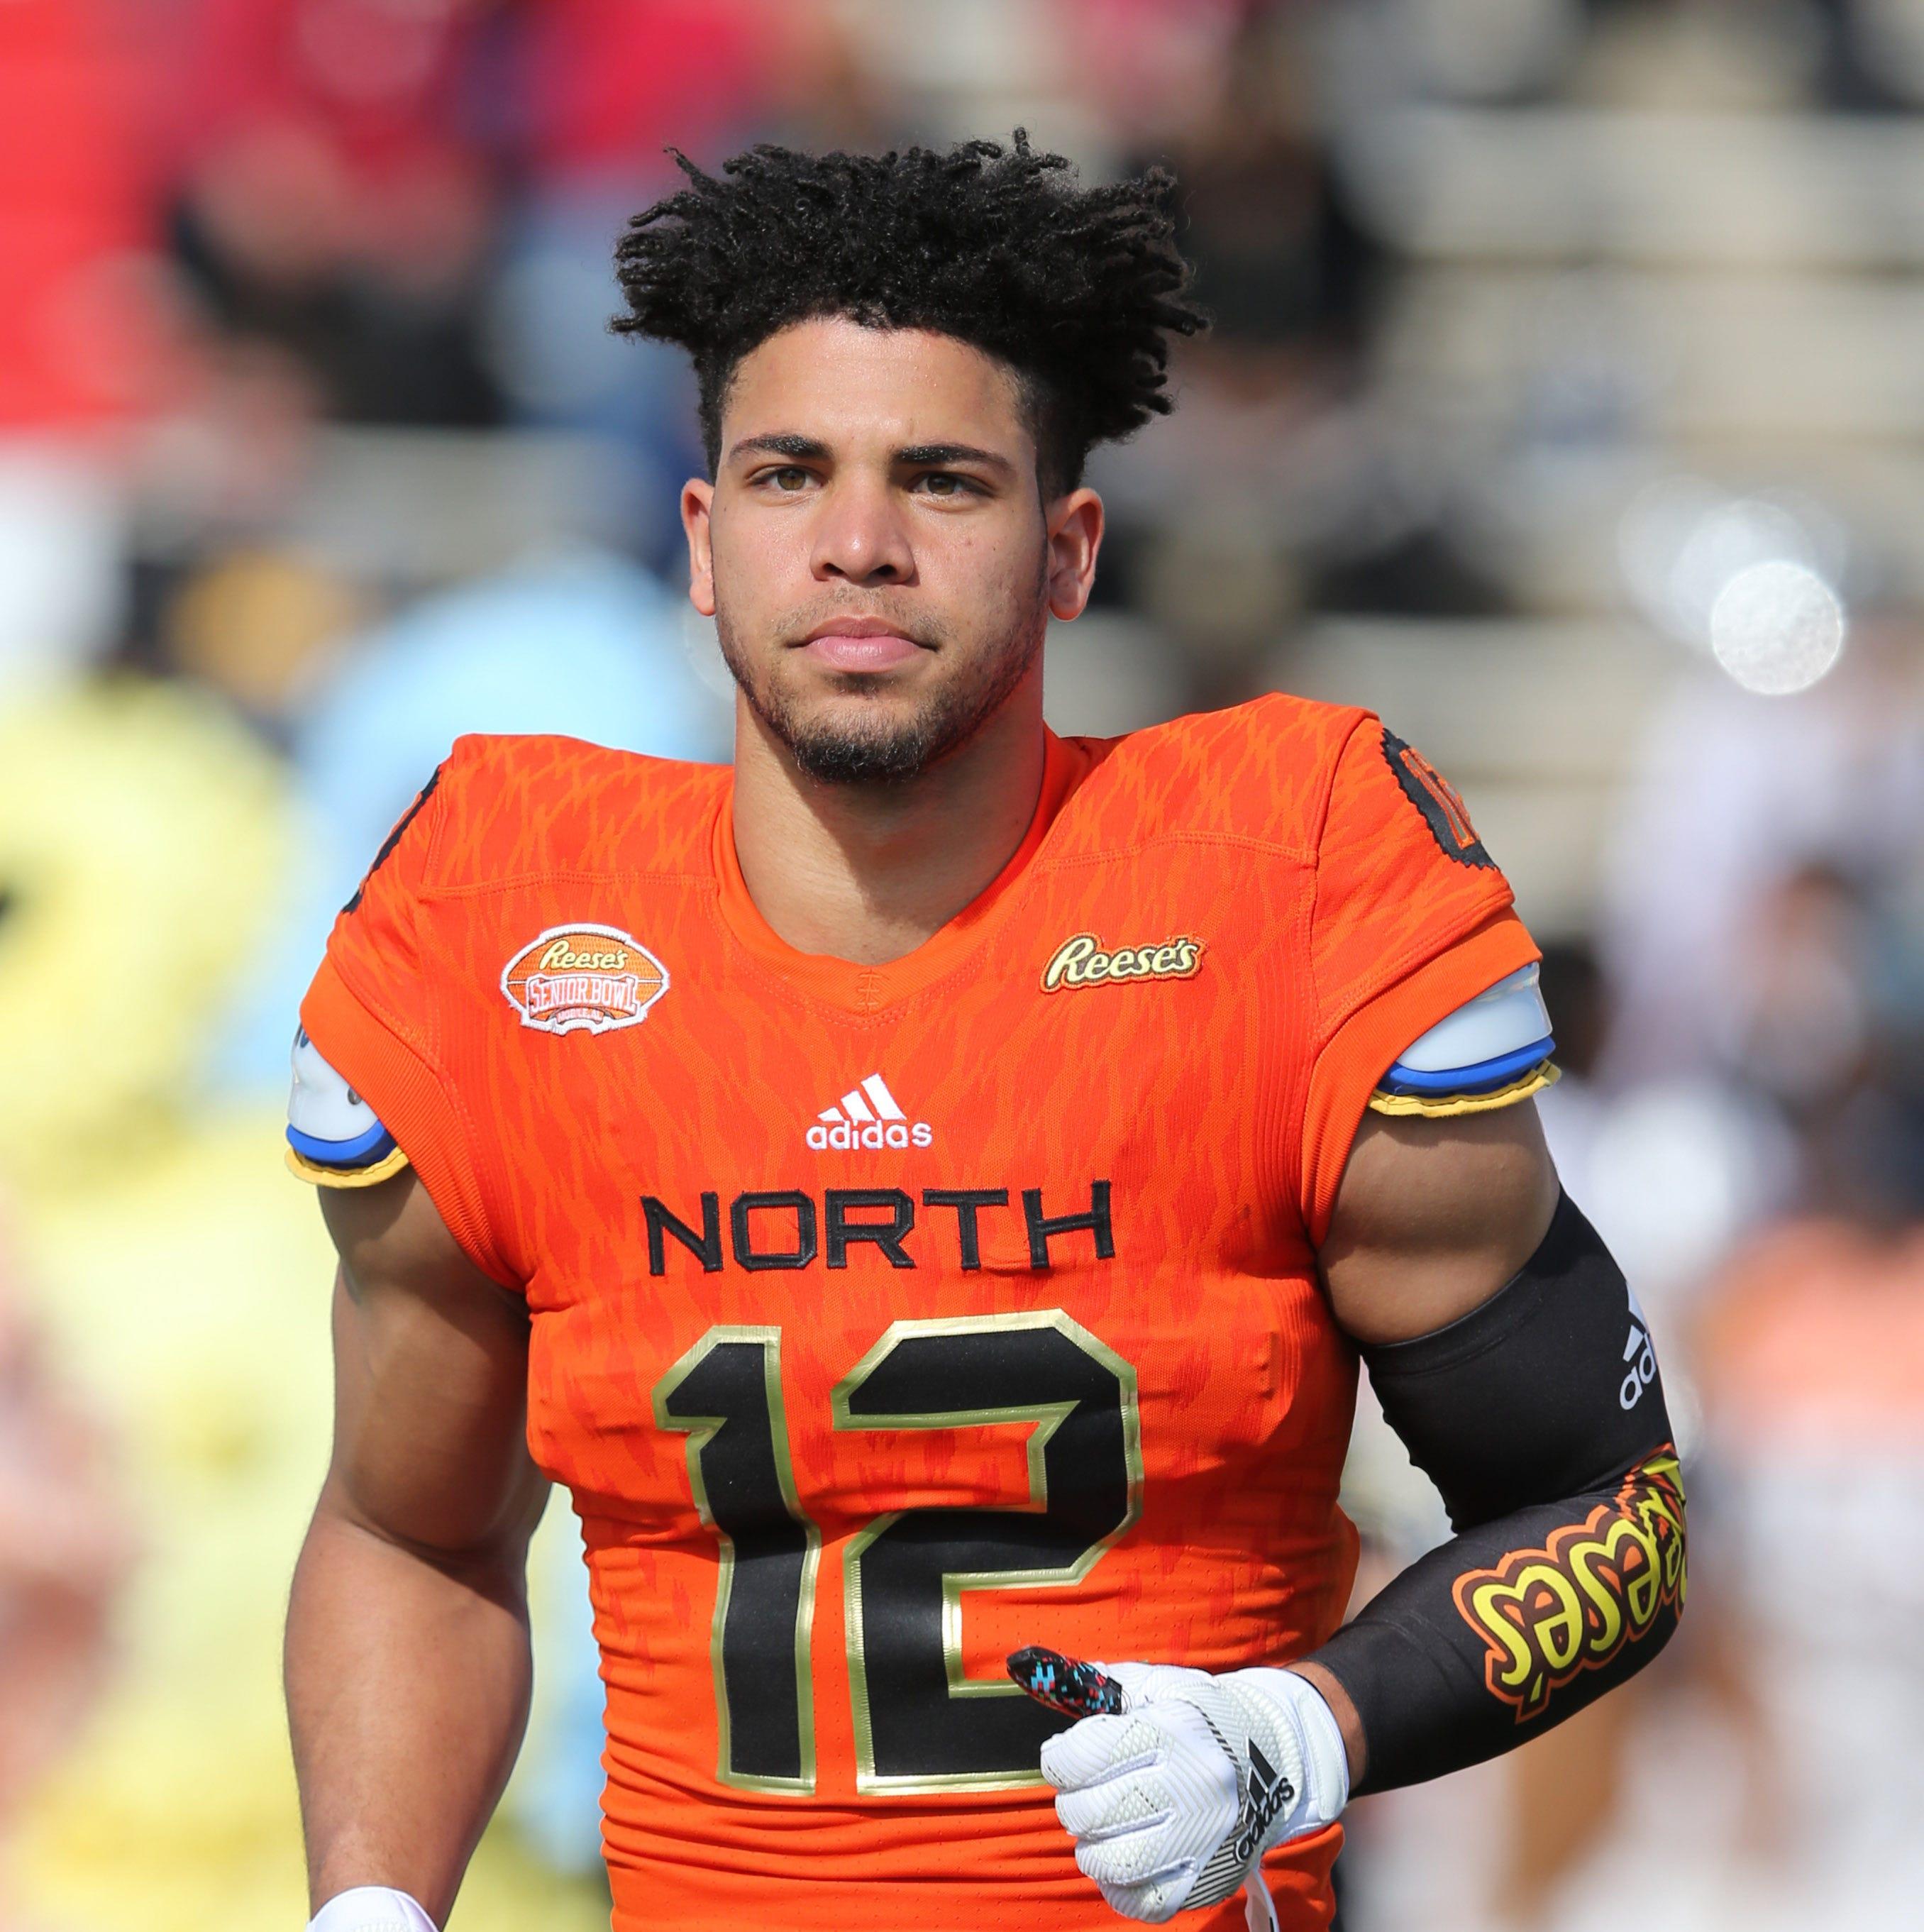 2019 NFL Draft analysis: Cincinnati Bengals seventh round (223): Jordan Brown, DB, South Dakota State